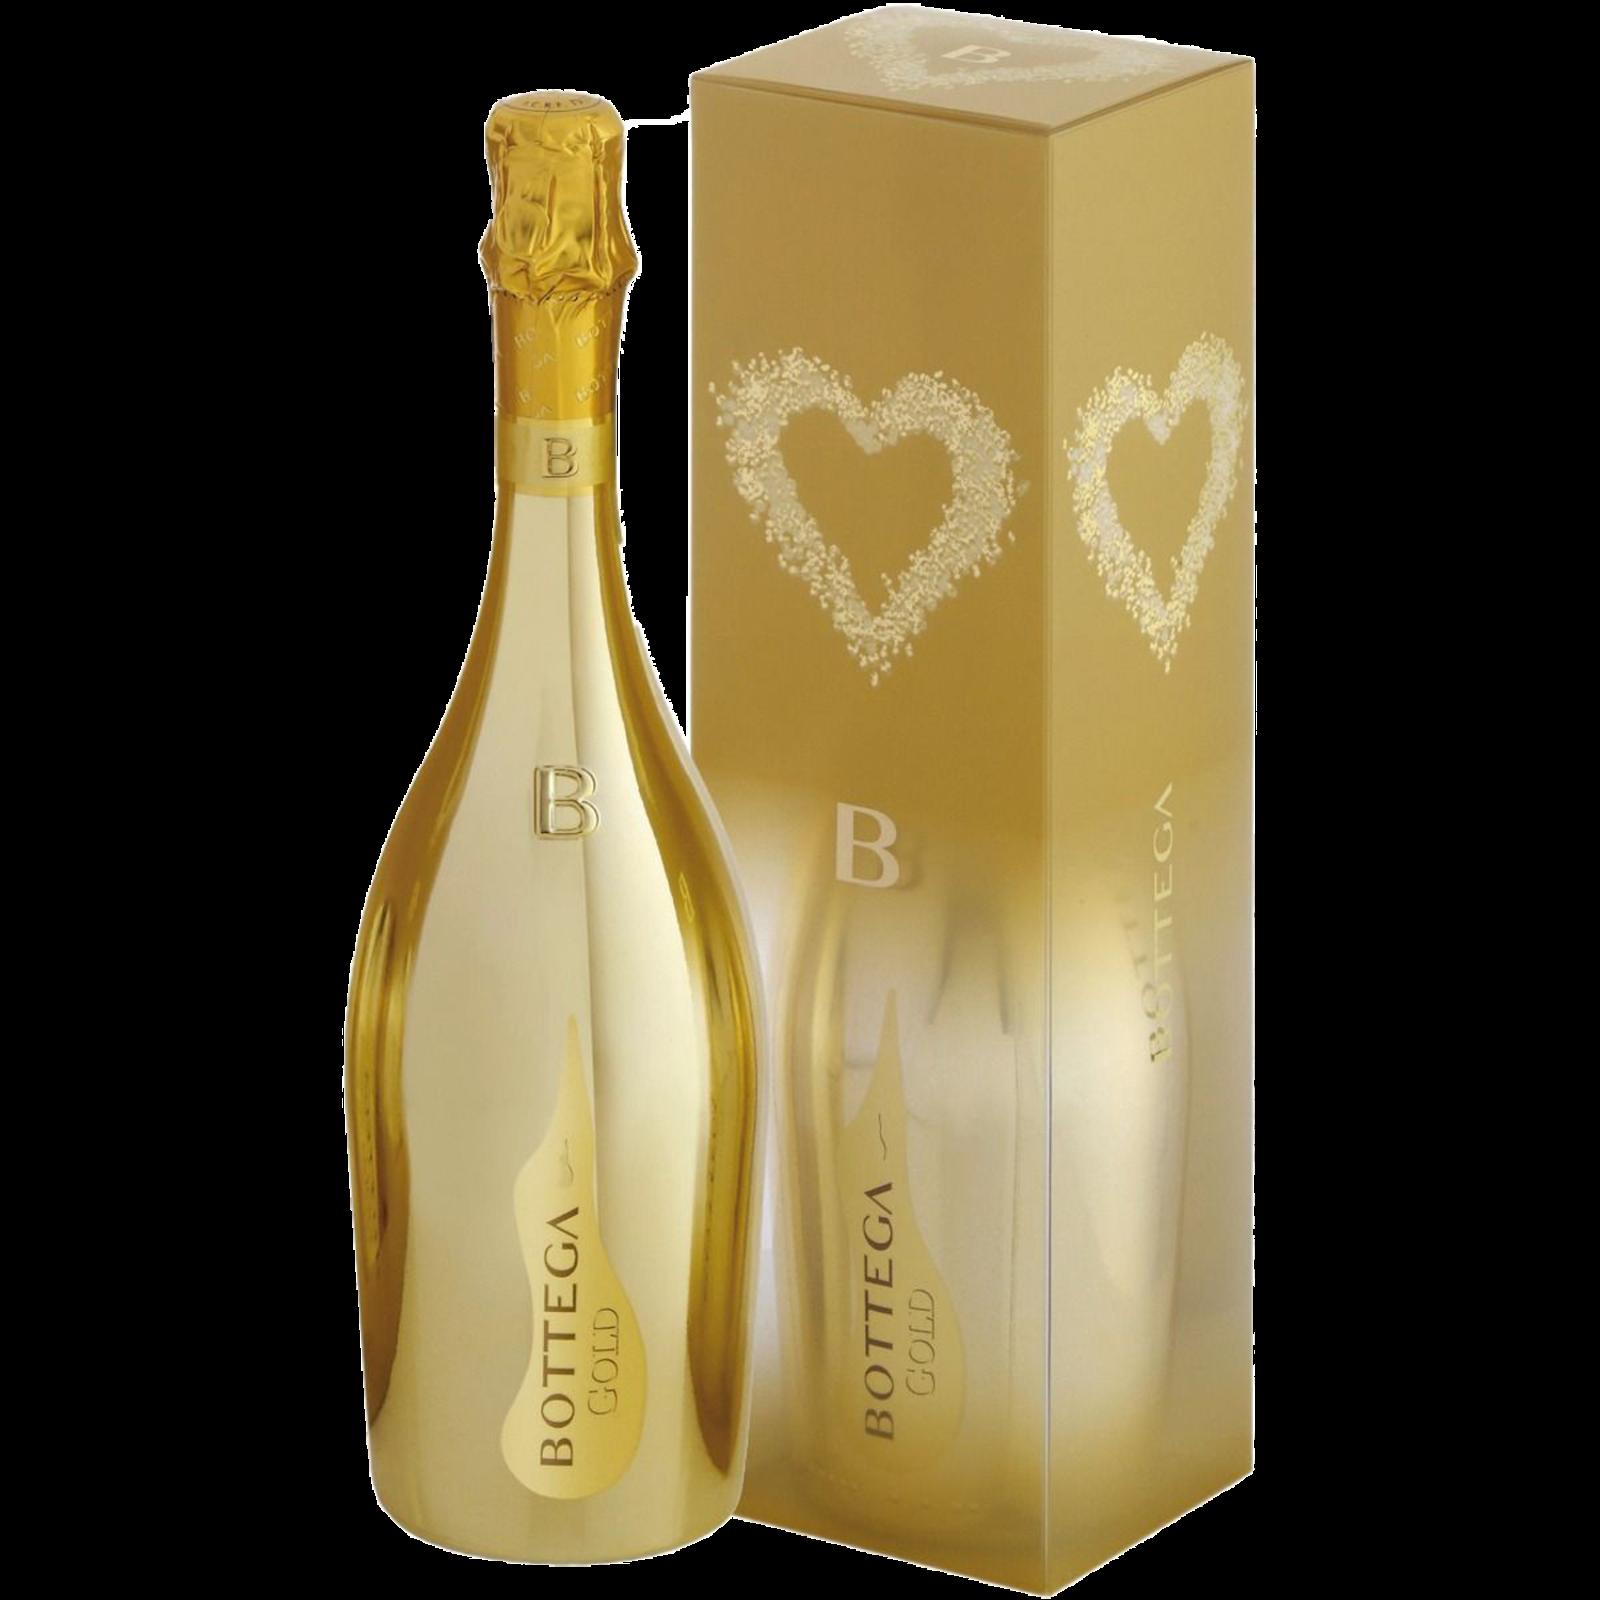 Bottega Bottega Gold Prosecco Geschenkverpakking